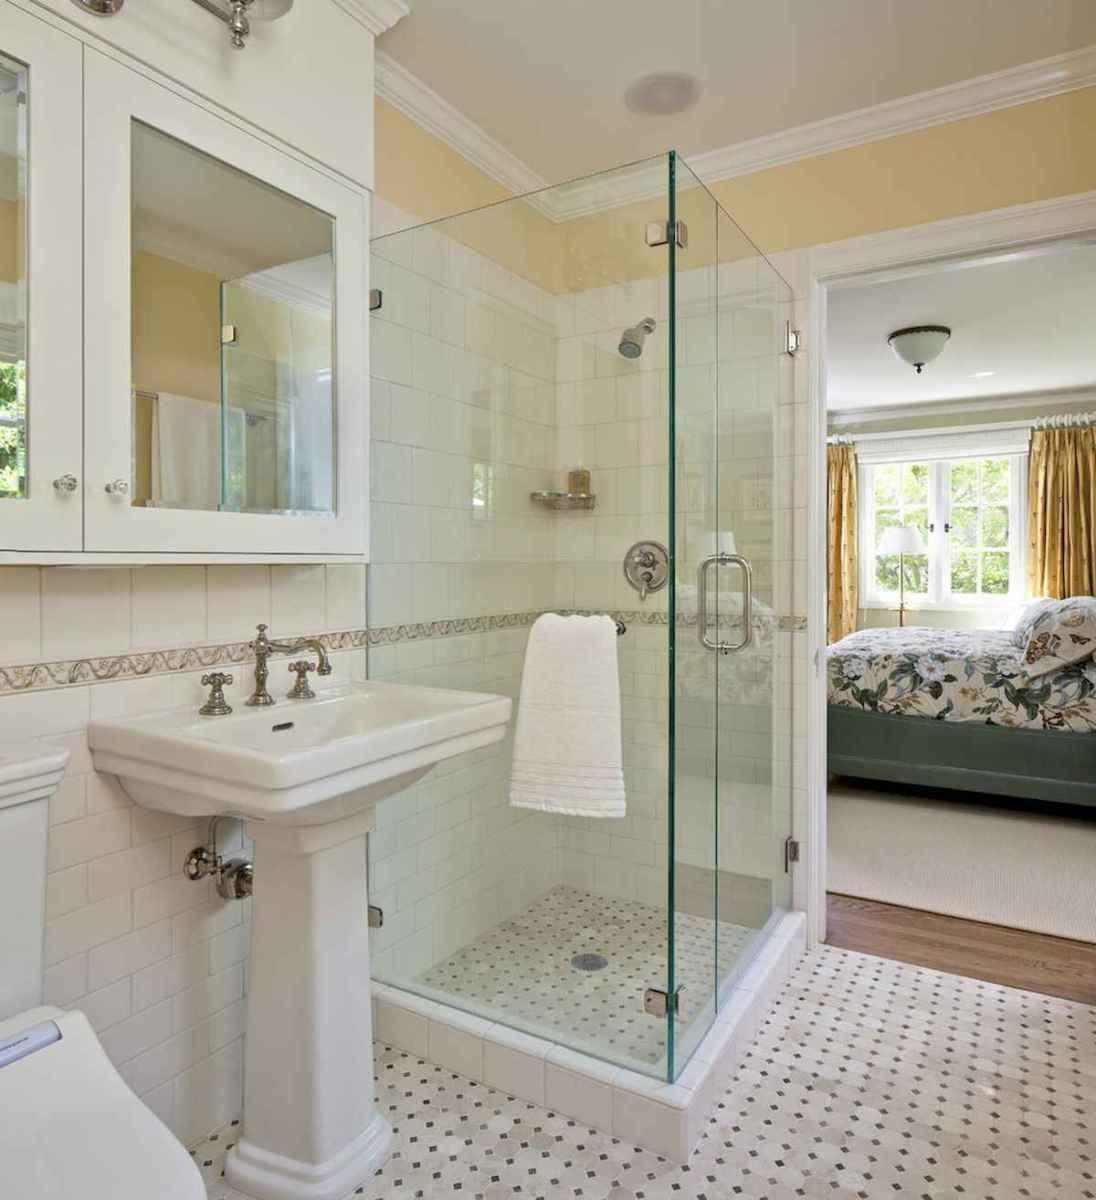 54 Amazing Small Bathroom Remodel Ideas (41)